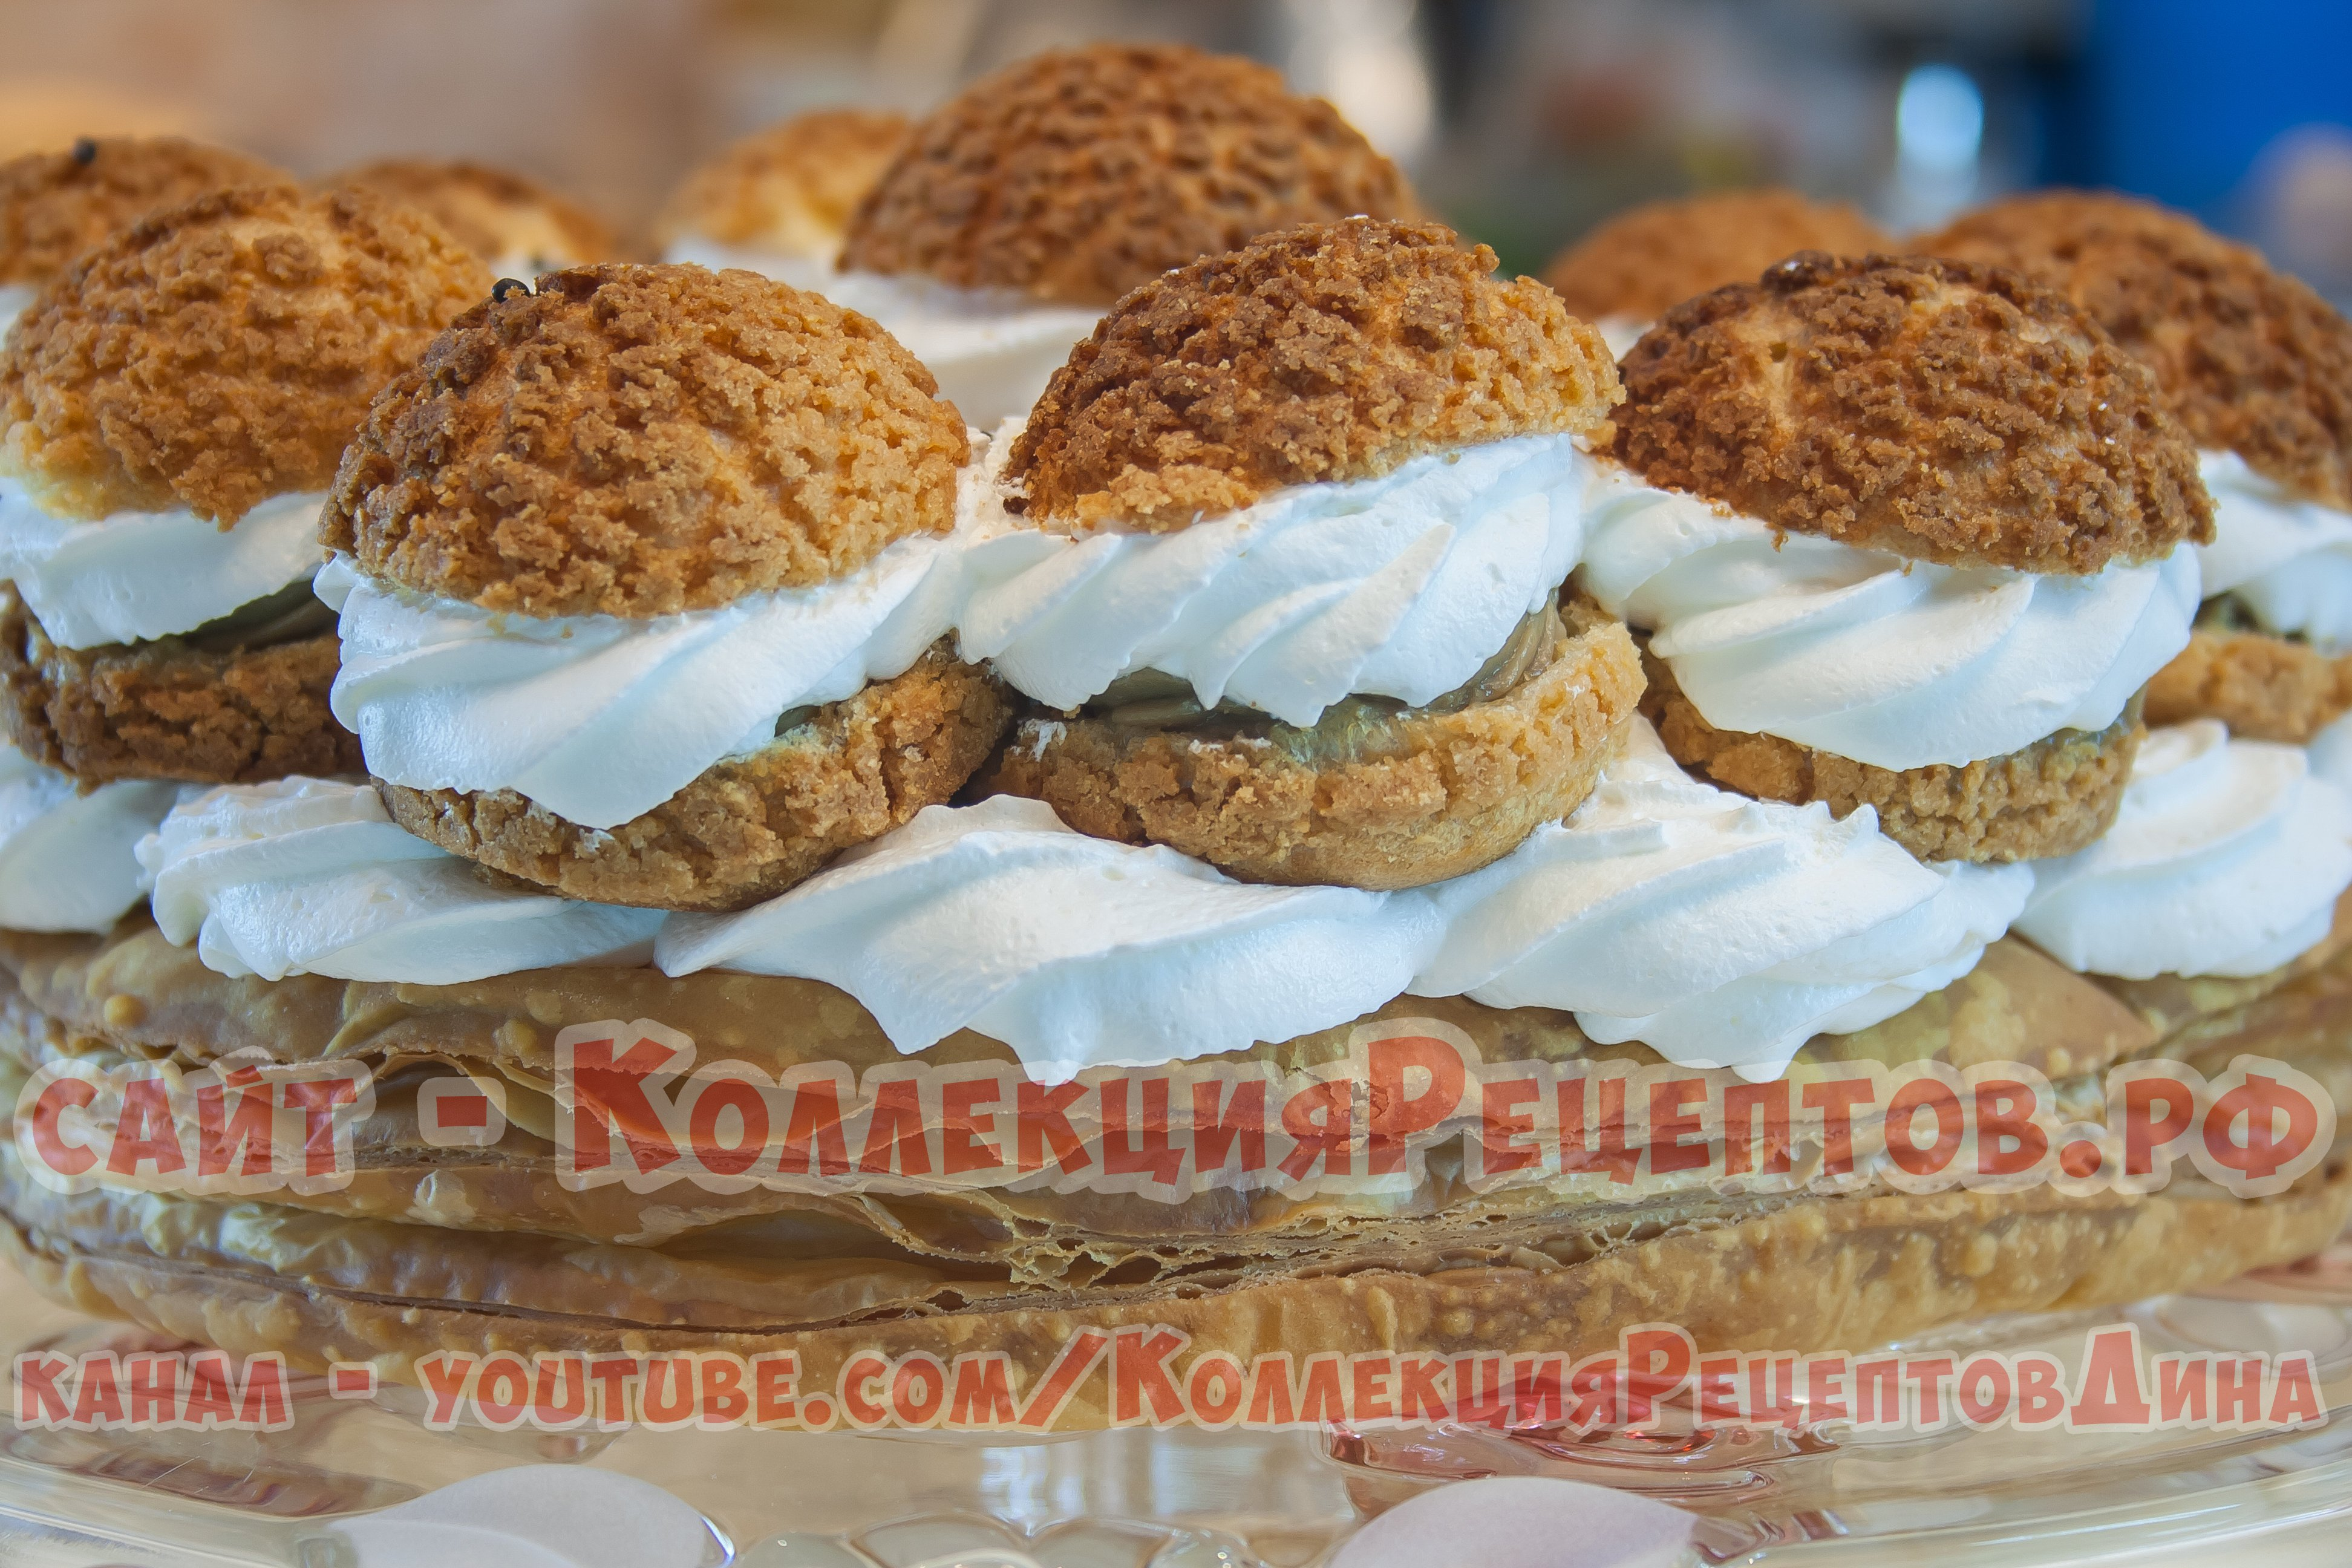 Торт Сент Оноре: рецепт с фото на Все о десертах 53